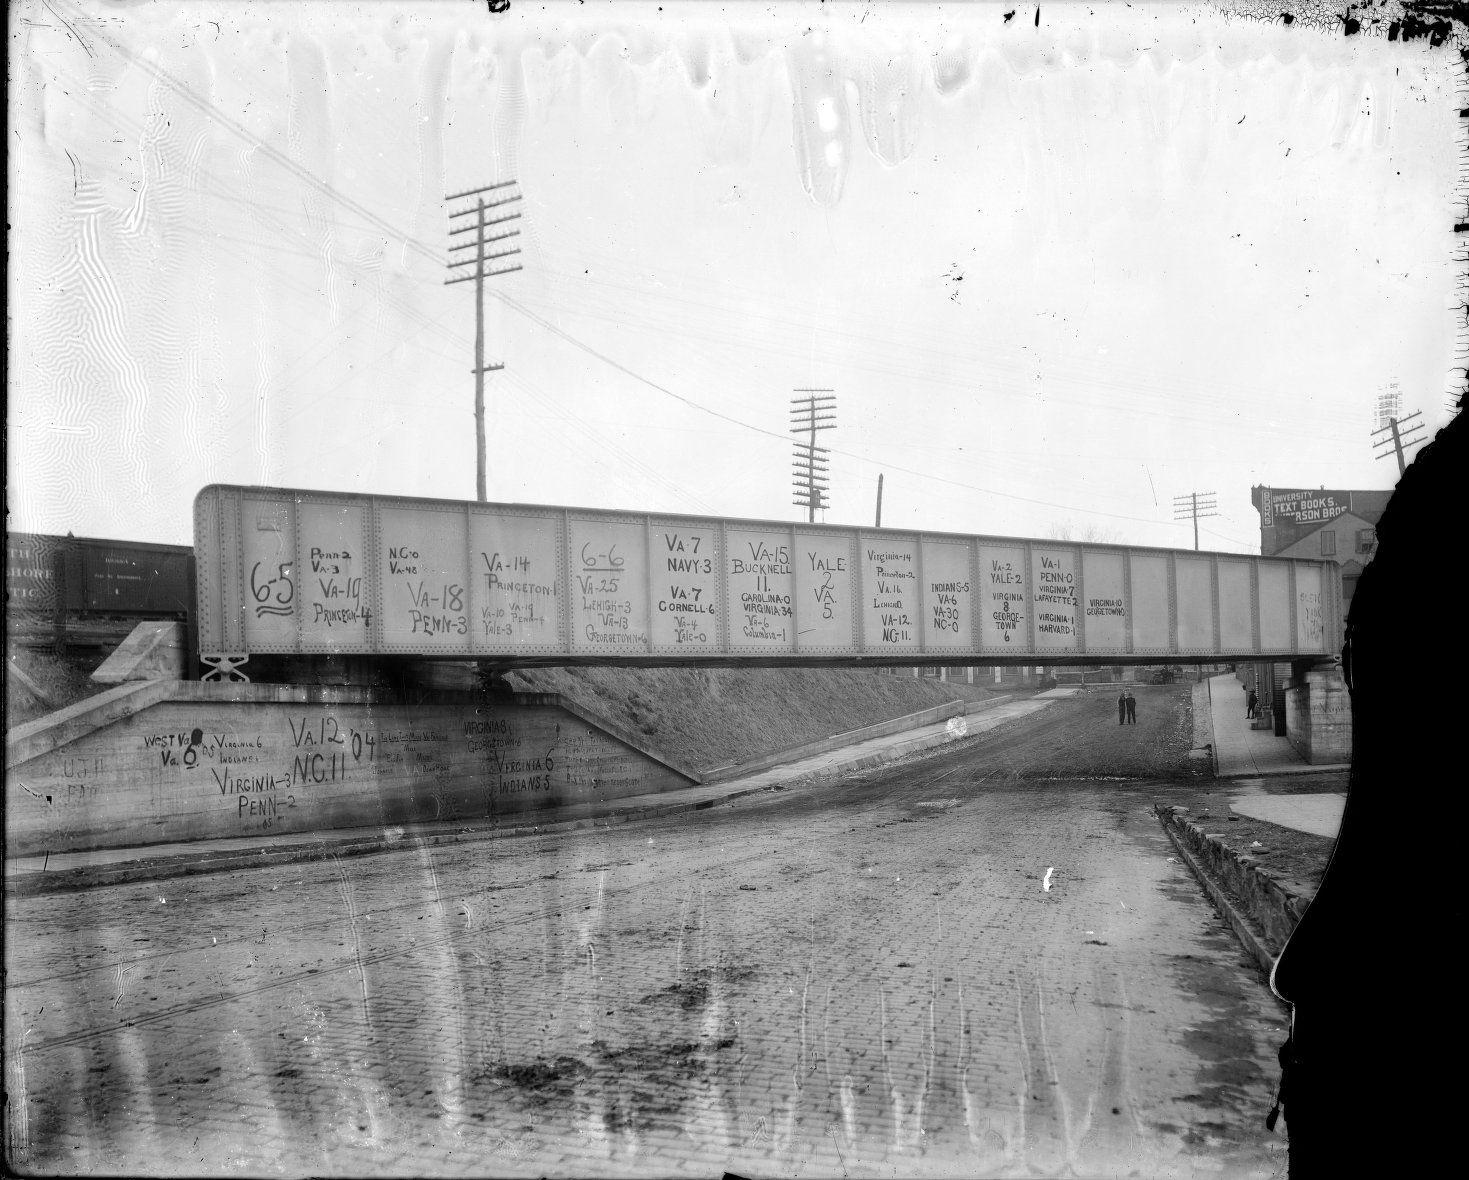 Football Scores on Chesapeake and Ohio Railway Bridge over